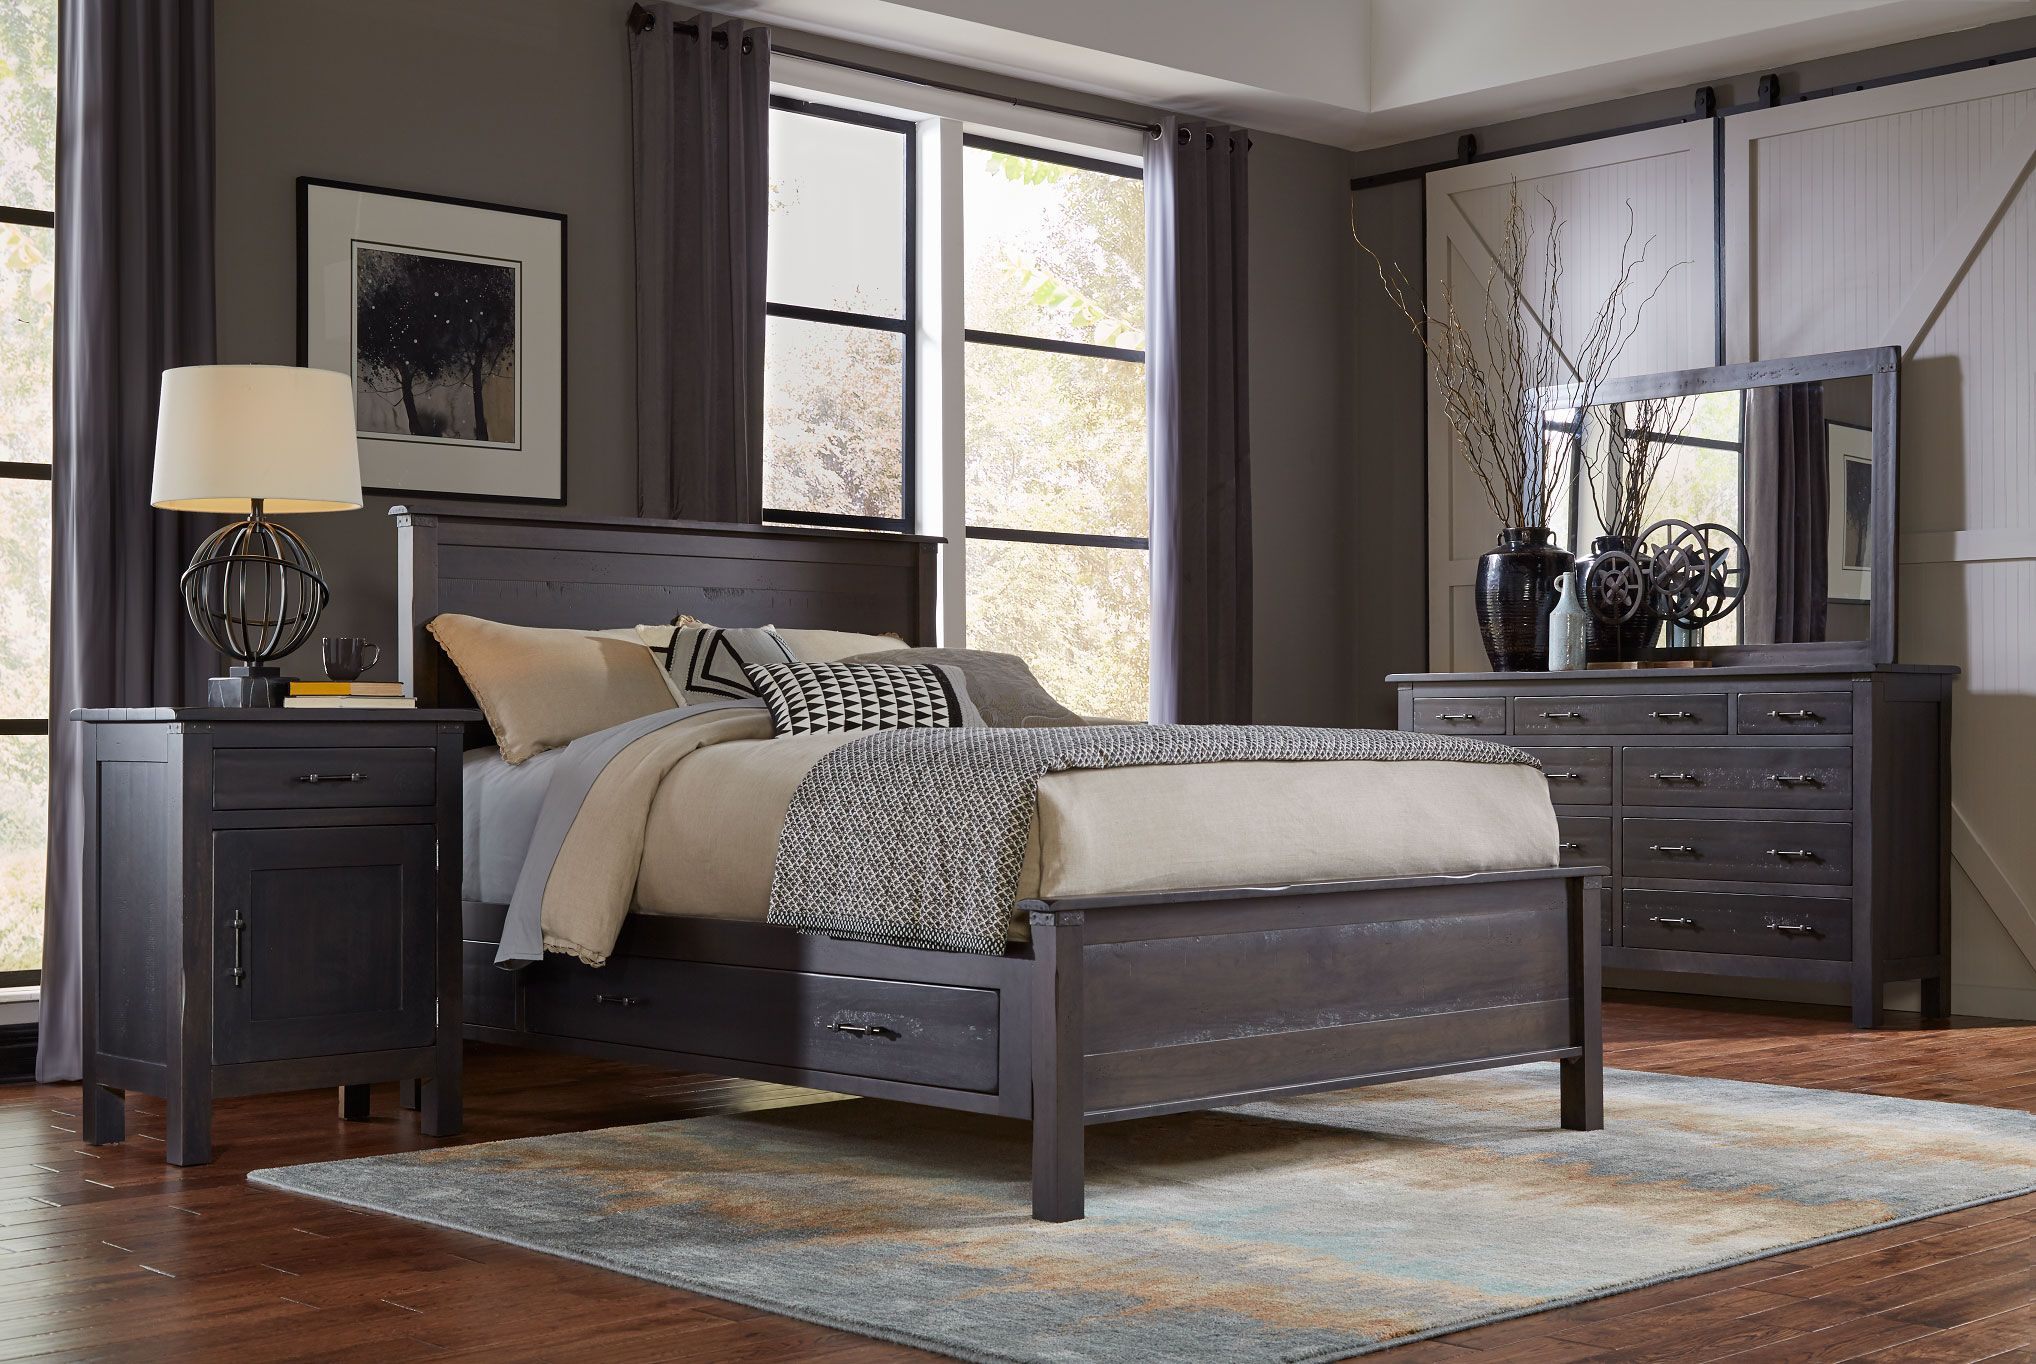 Wildwood Mirror Furniture Wood Bedroom Second Furniture